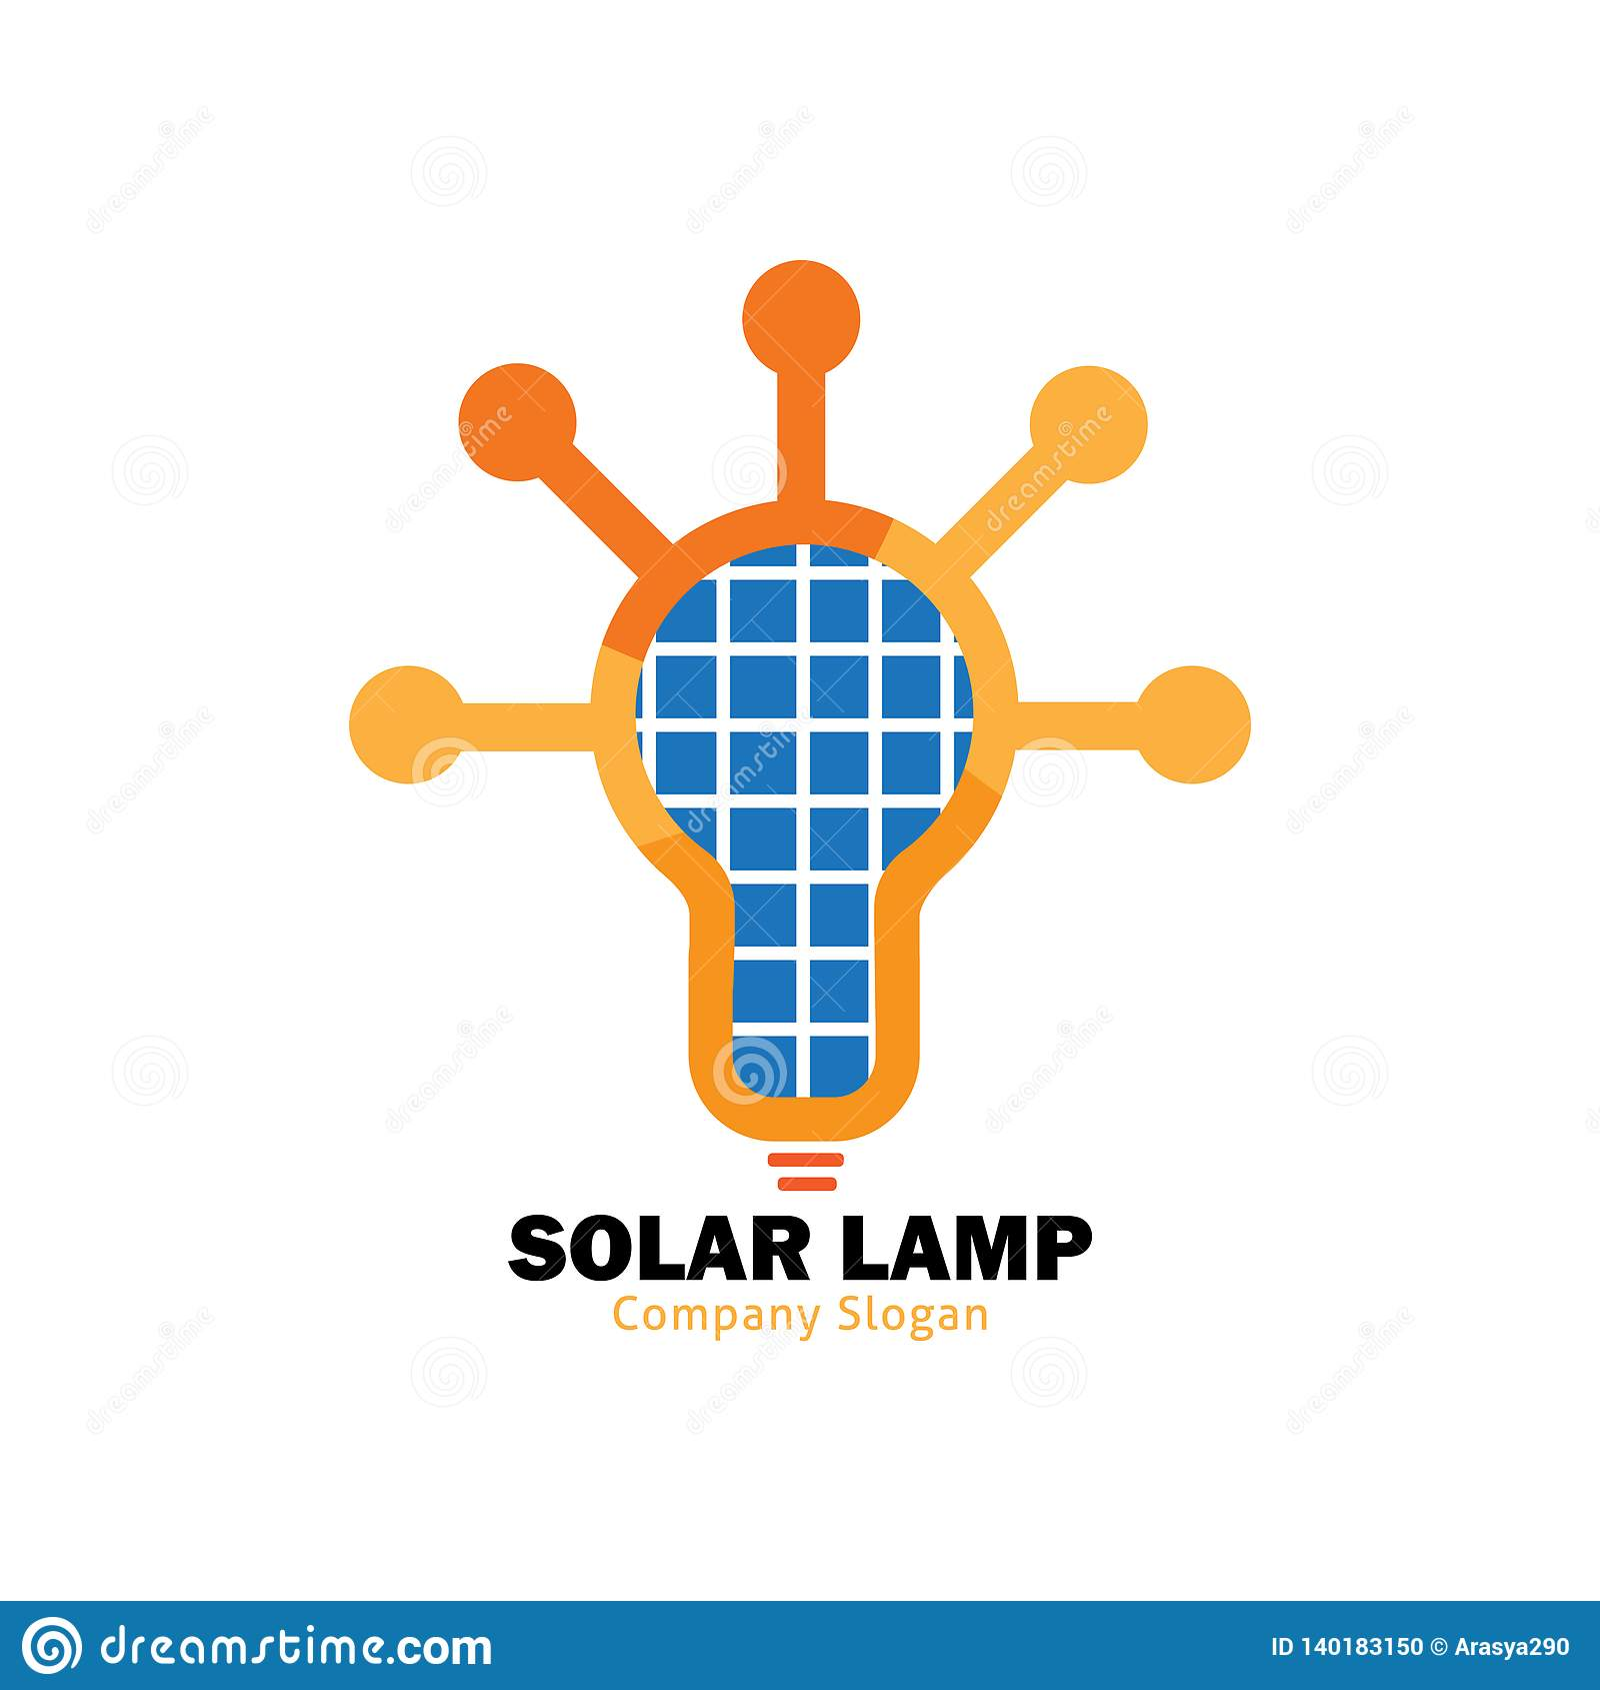 Sol- lamplogo